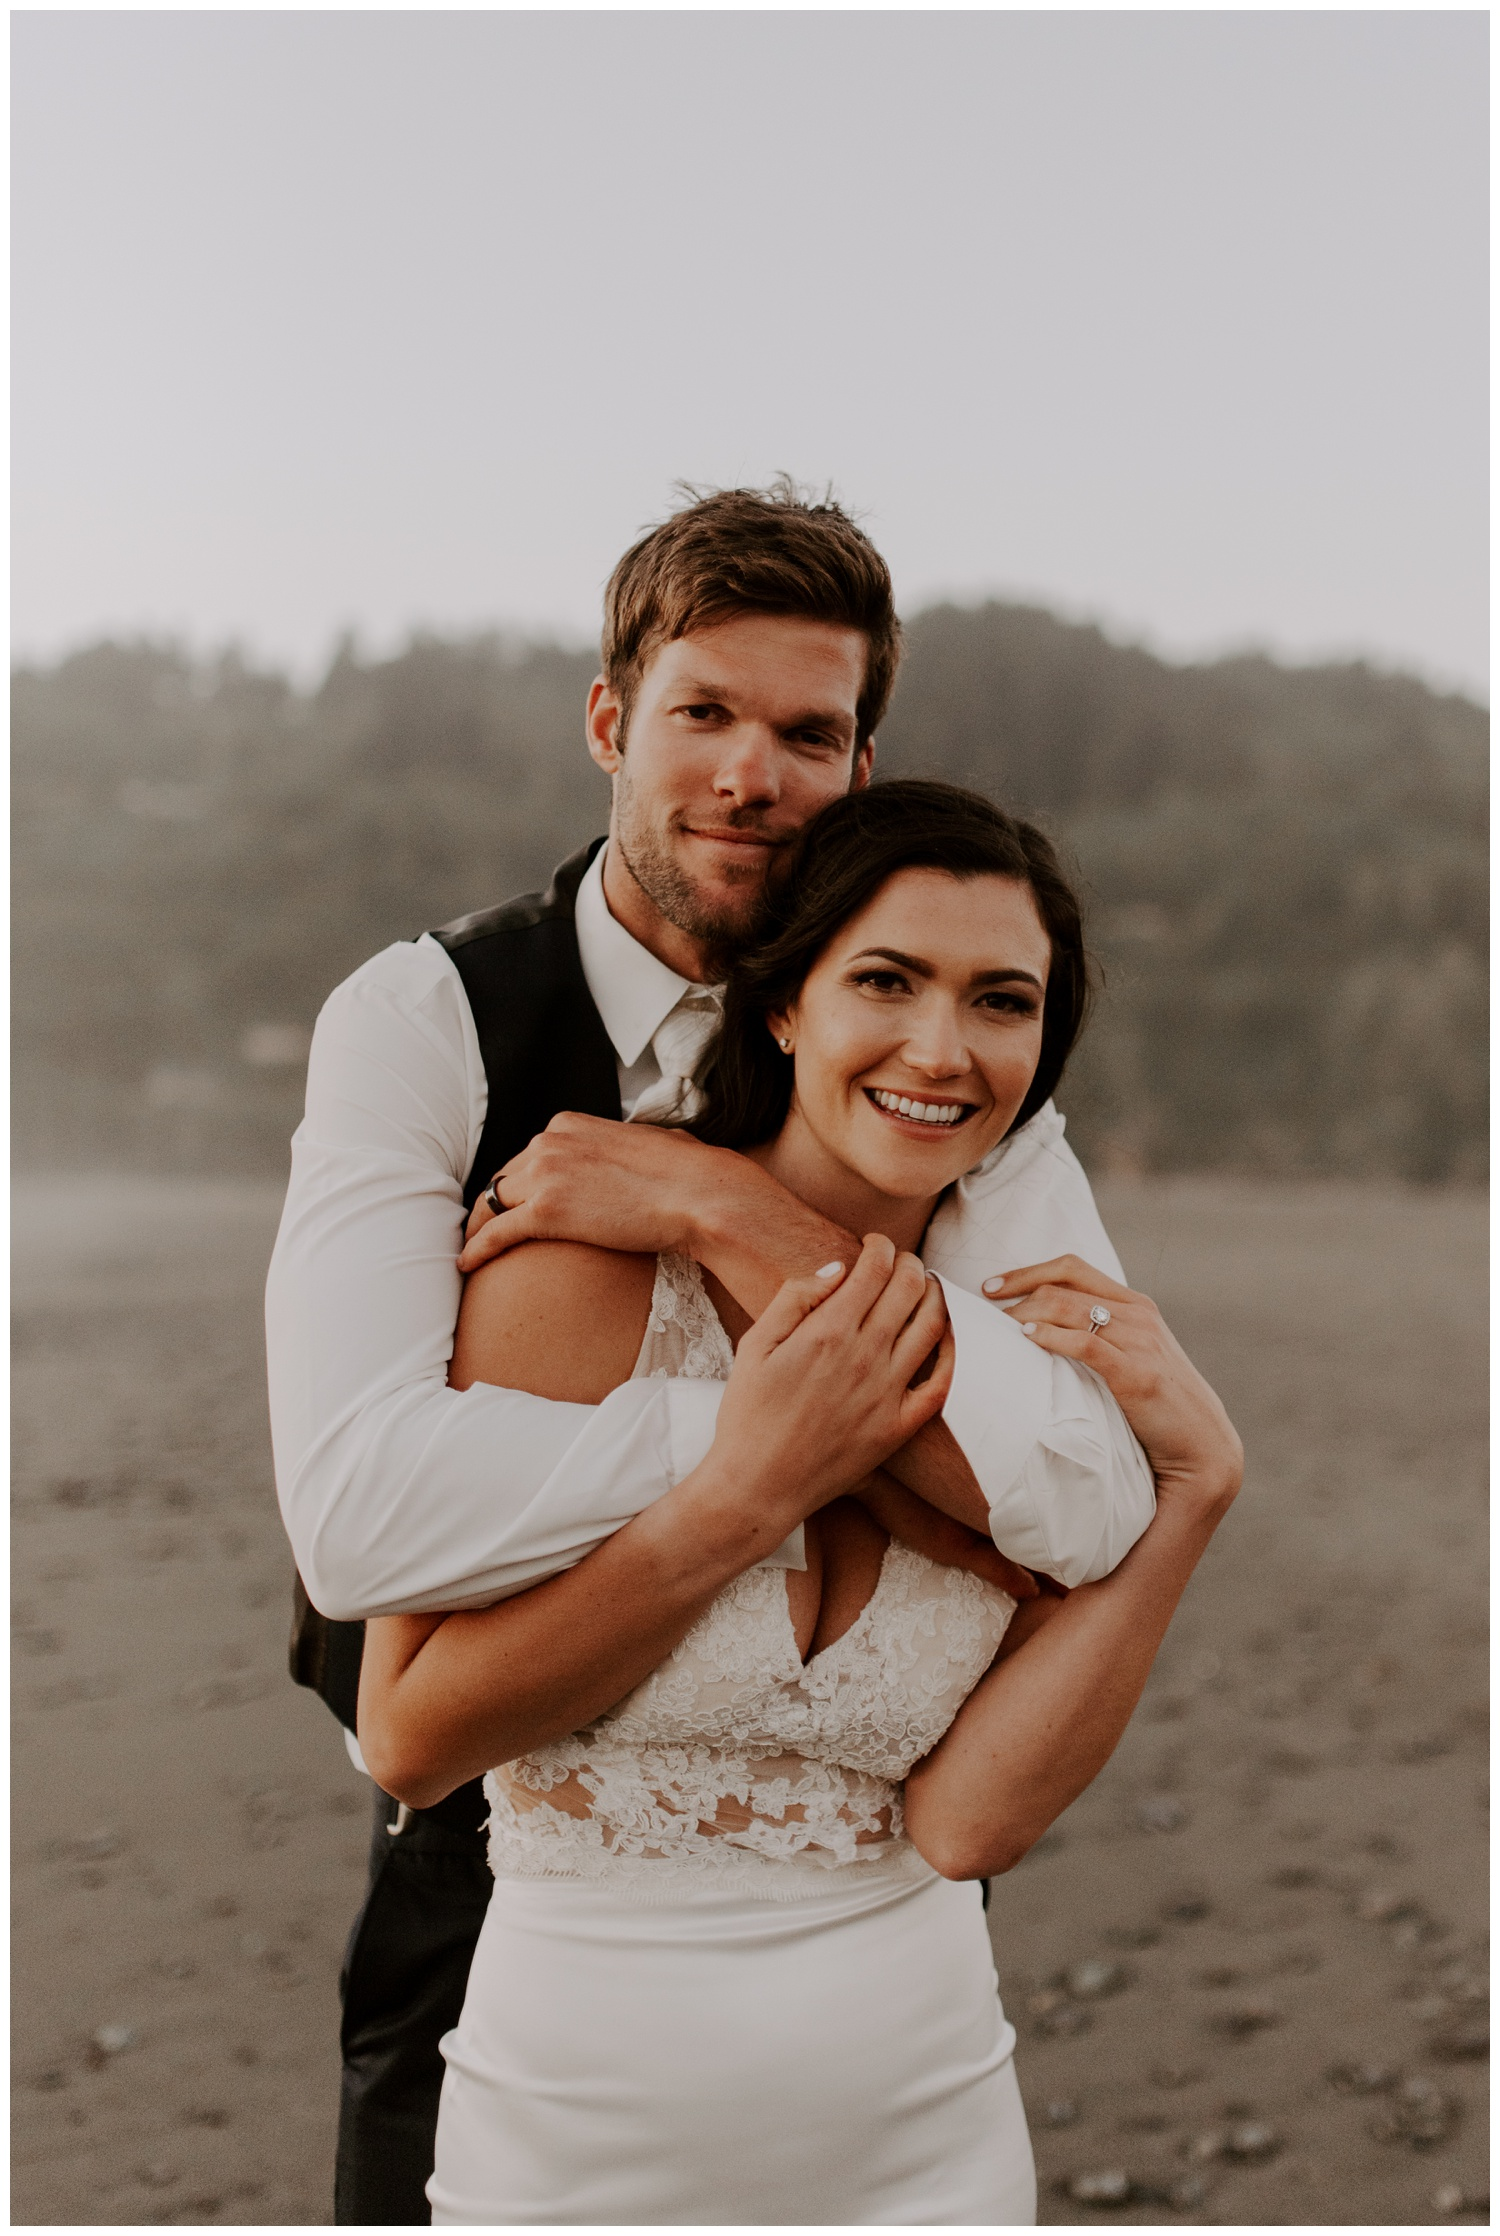 Klamath River Northern California Wedding - Oceana and Kenton - Jessica Heron Images 093.jpg